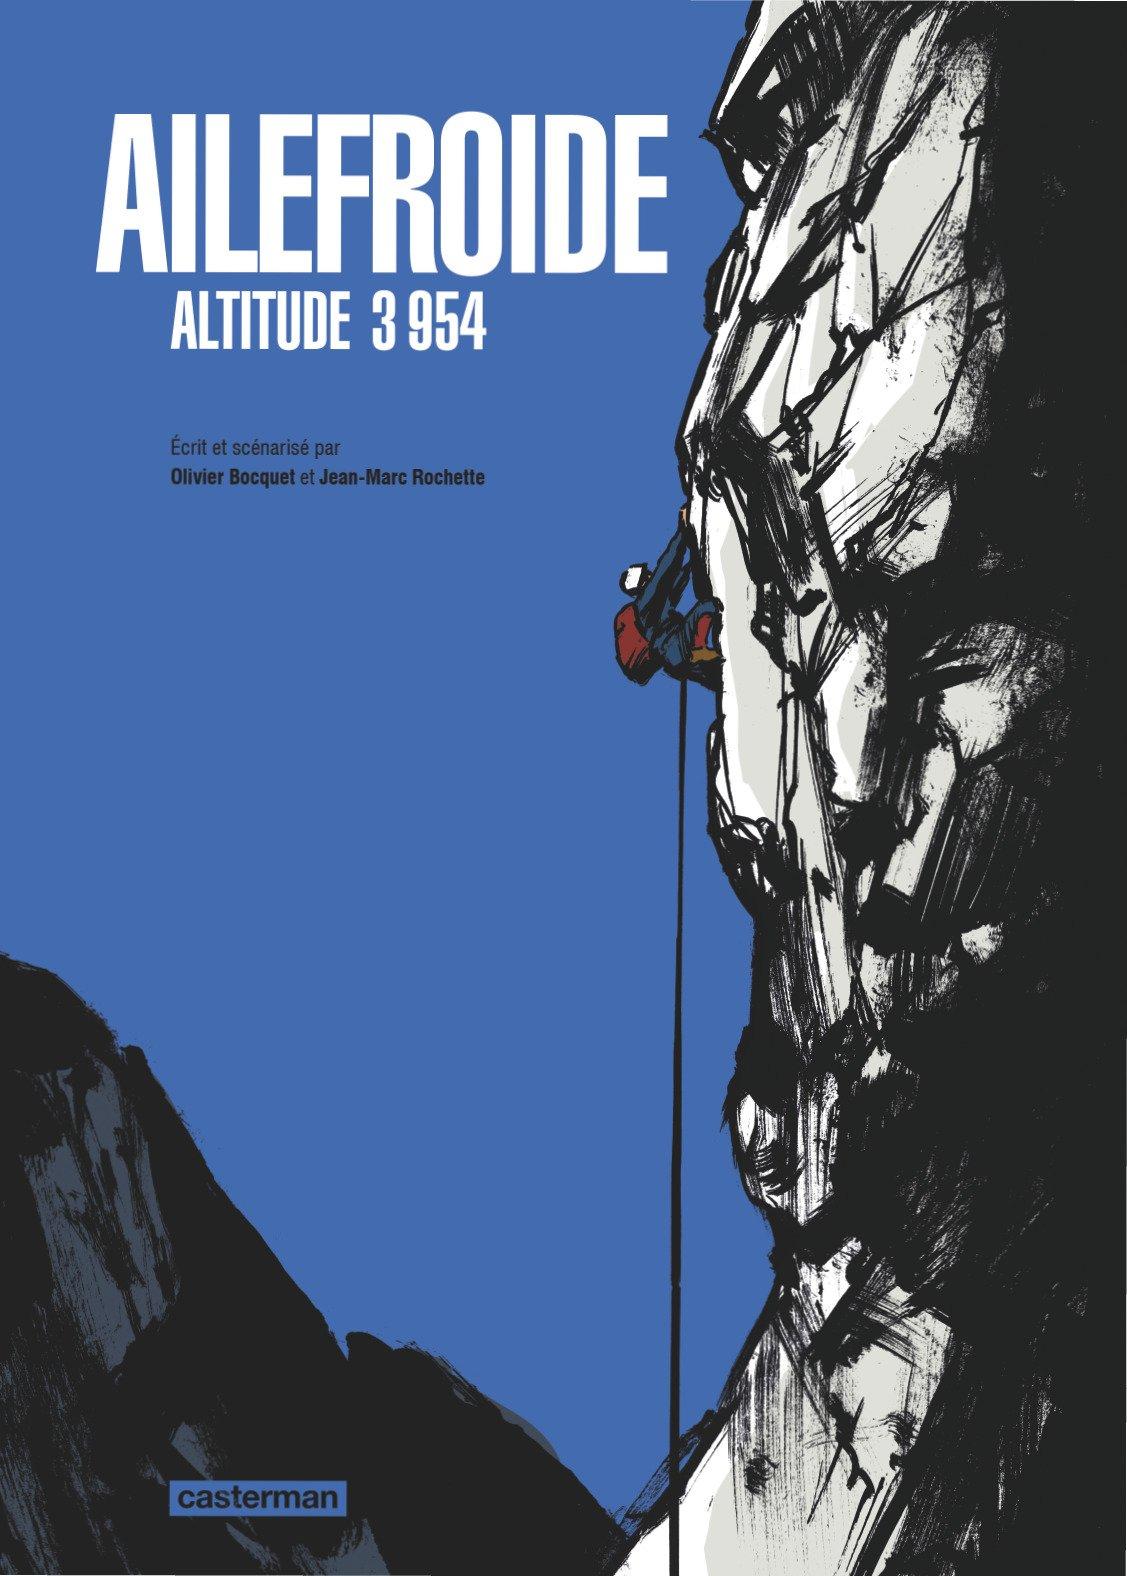 Ailefroide 1 - Altitude 3954